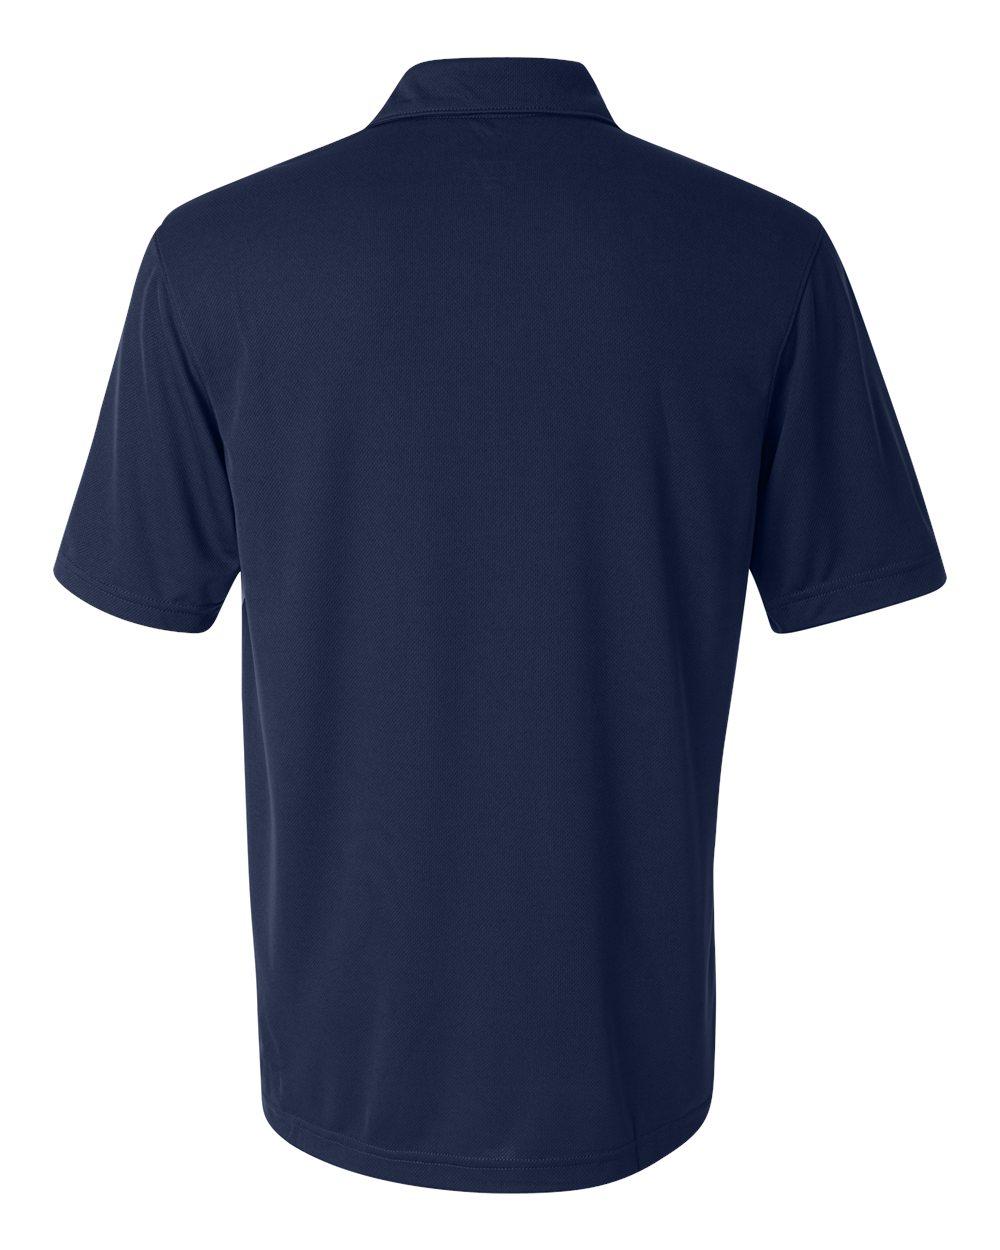 Augusta-Mens-Sportswear-Two-Tone-Premier-Sport-Shirt-5012-up-to-3XL miniature 10